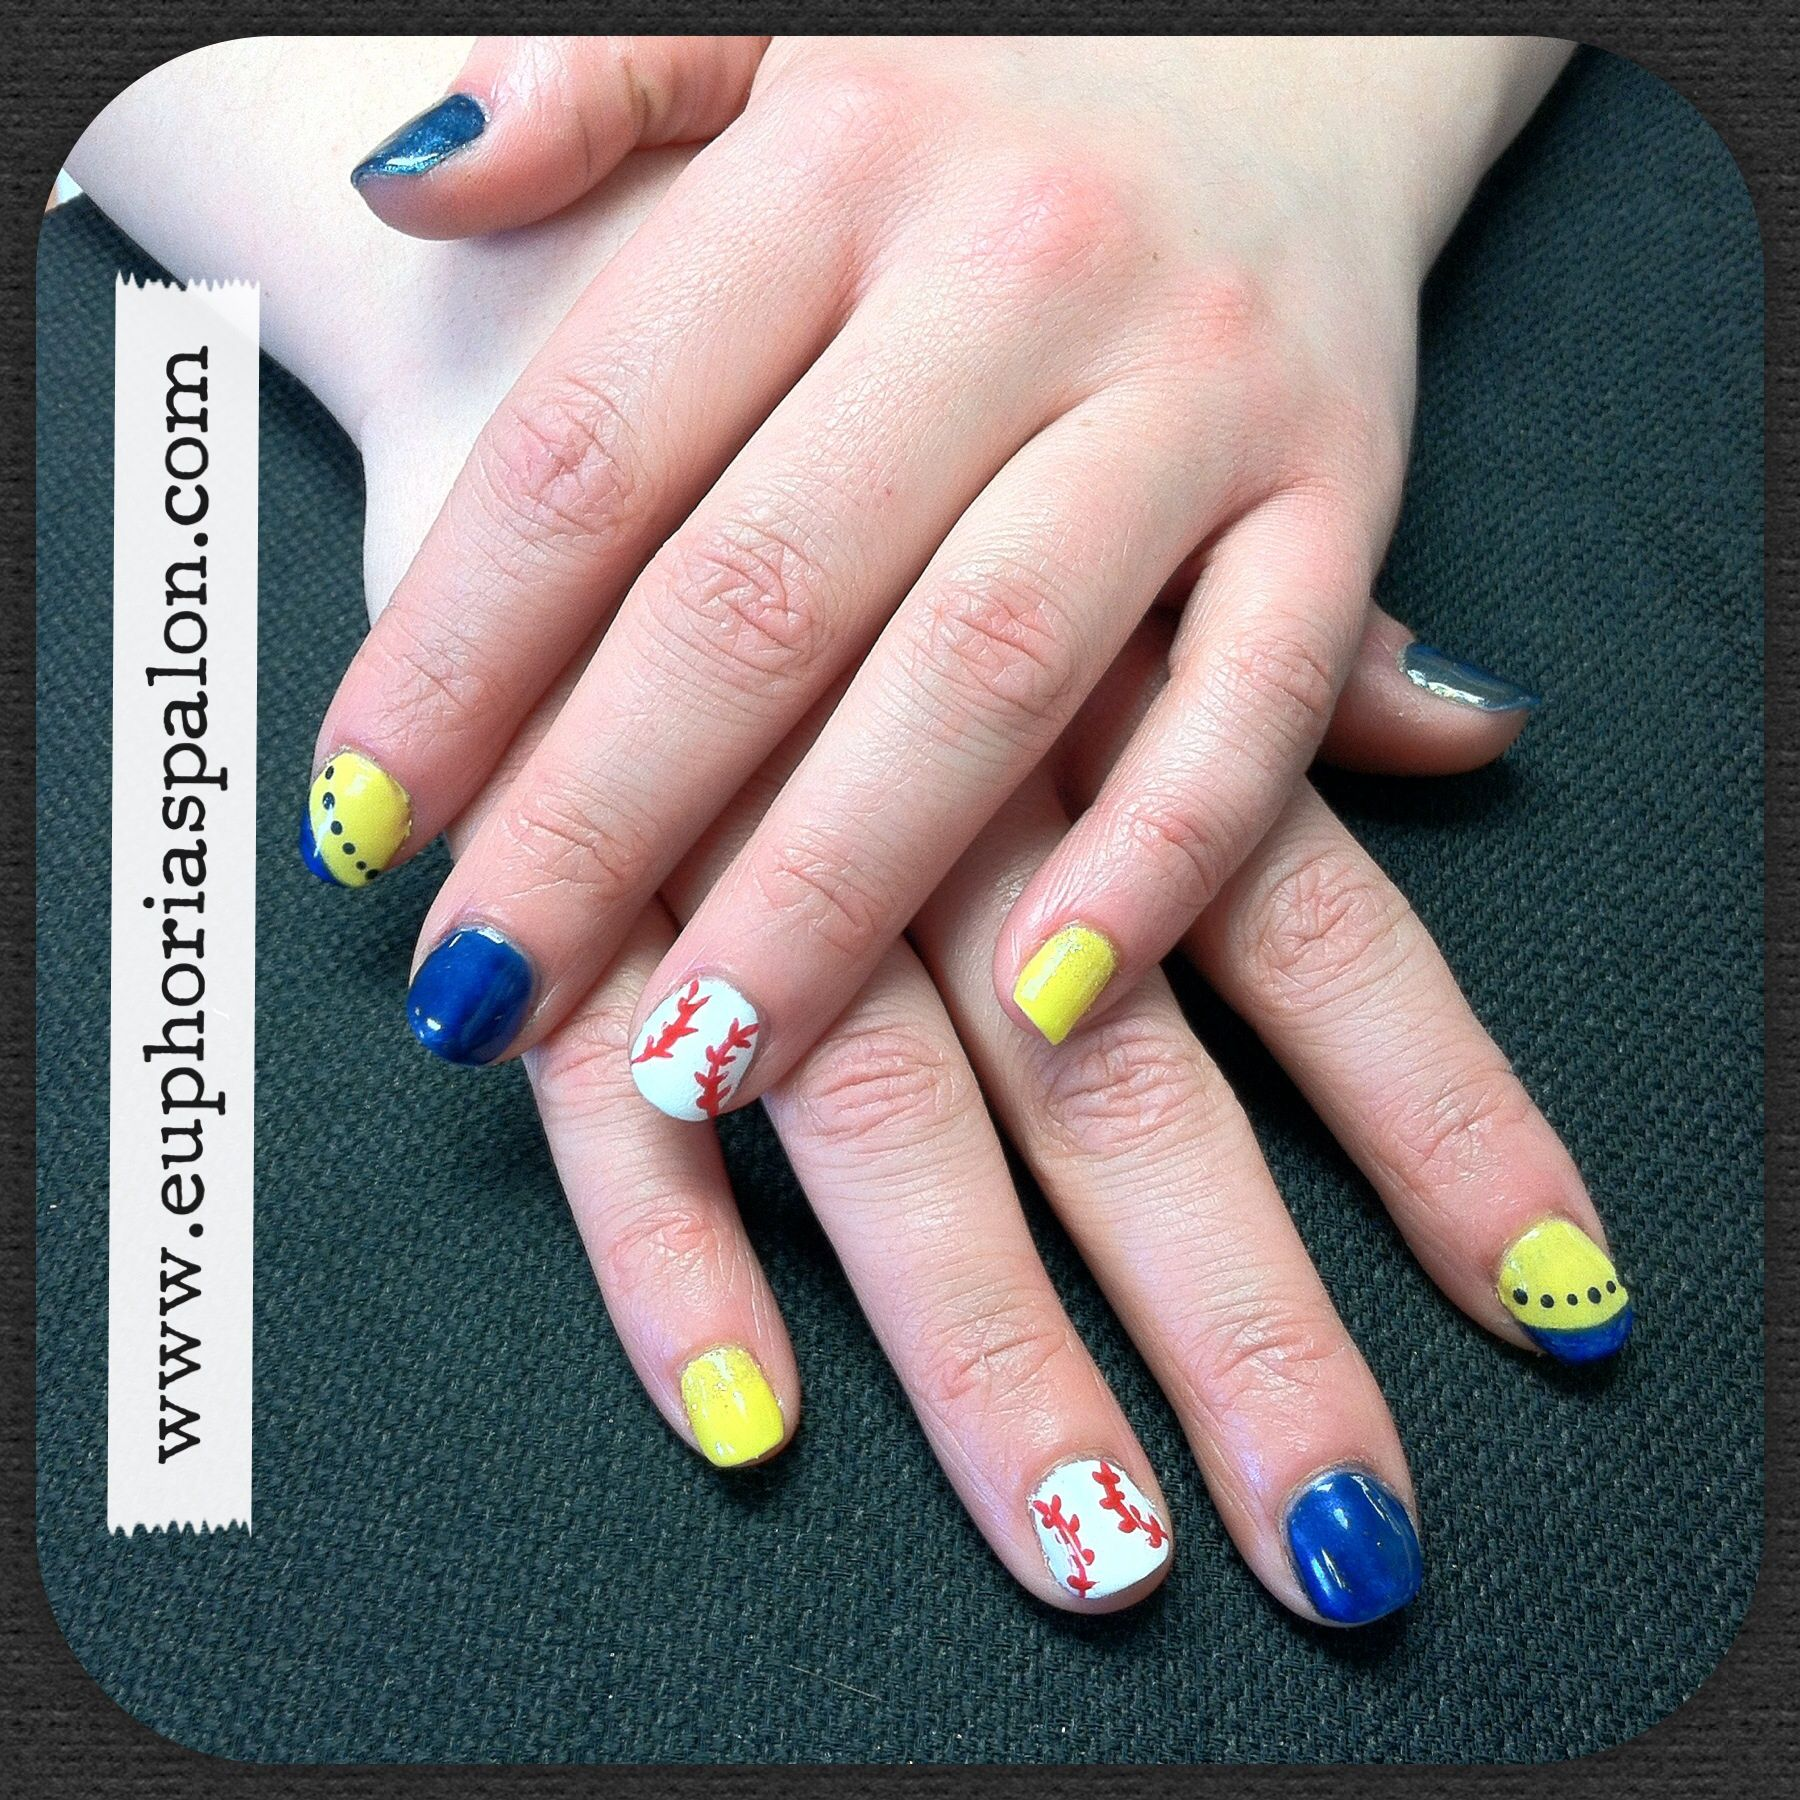 Milwaukee Brewers Nails | Baseball Nails | Blue & Yellow Nails | CND ...